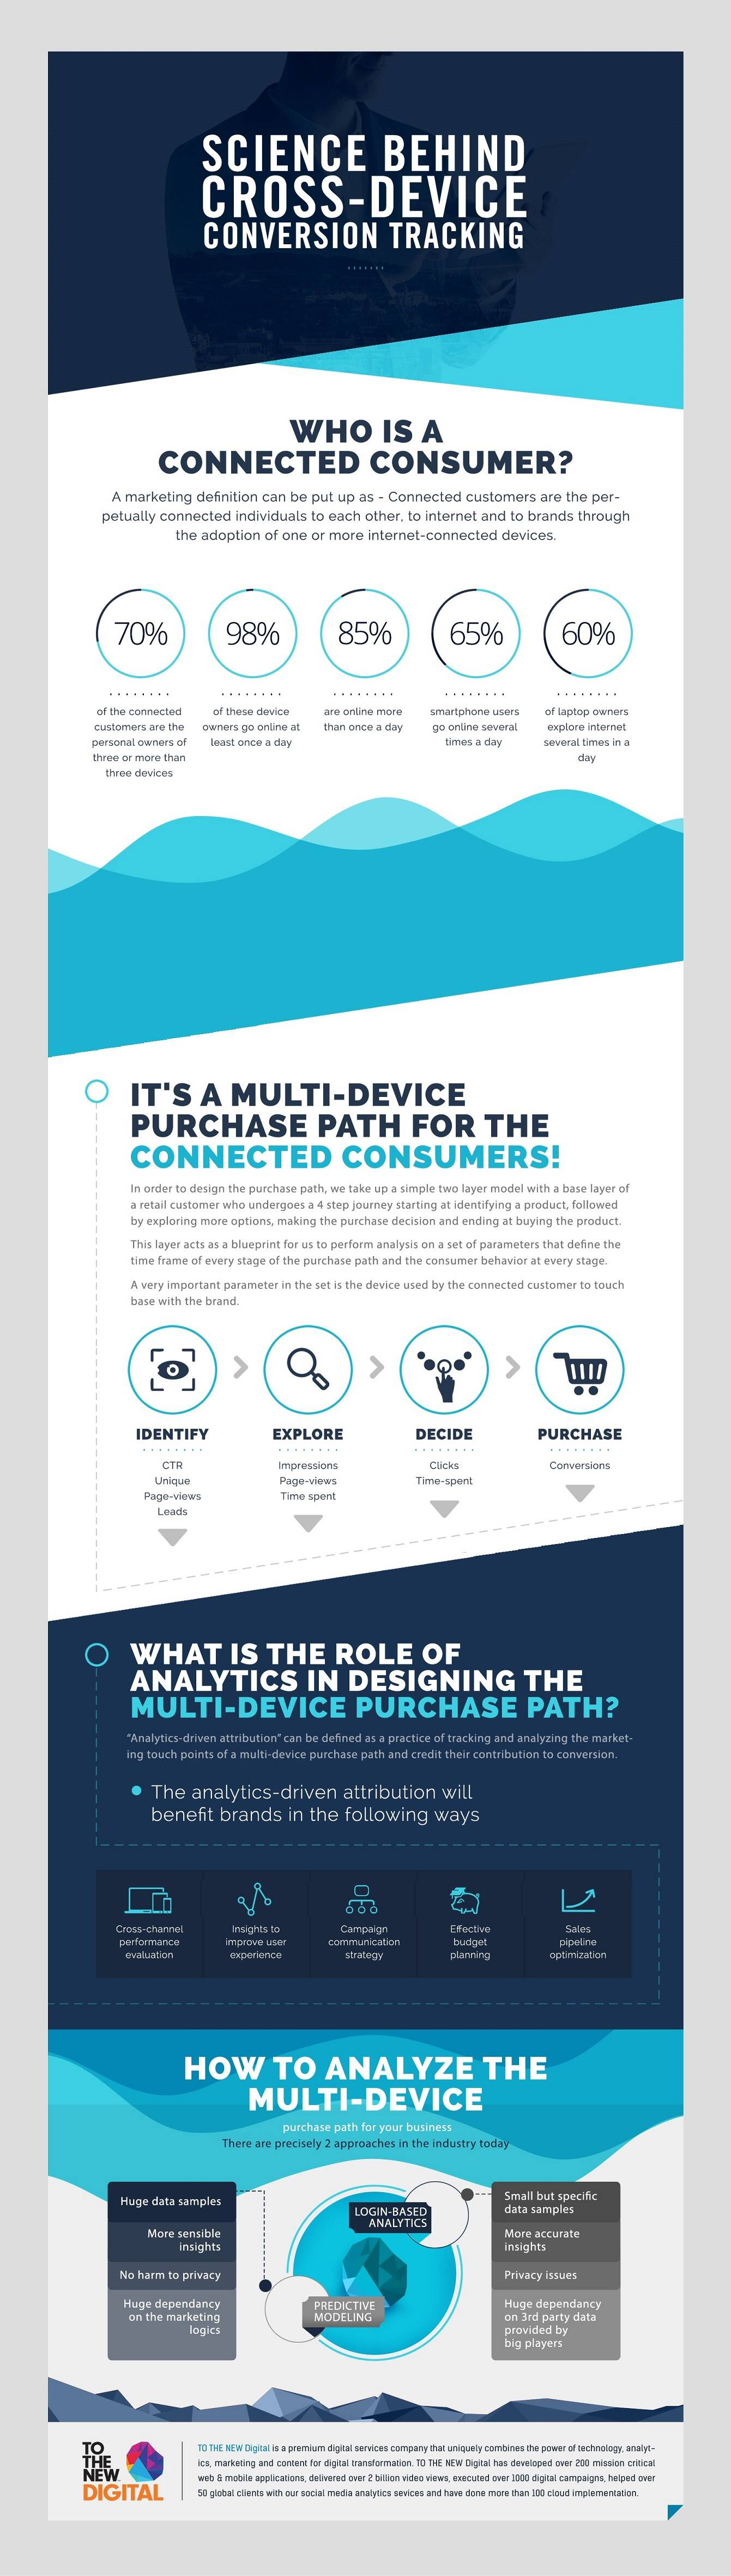 Cross-device-analytics-in-omni-channel-buyers-journey